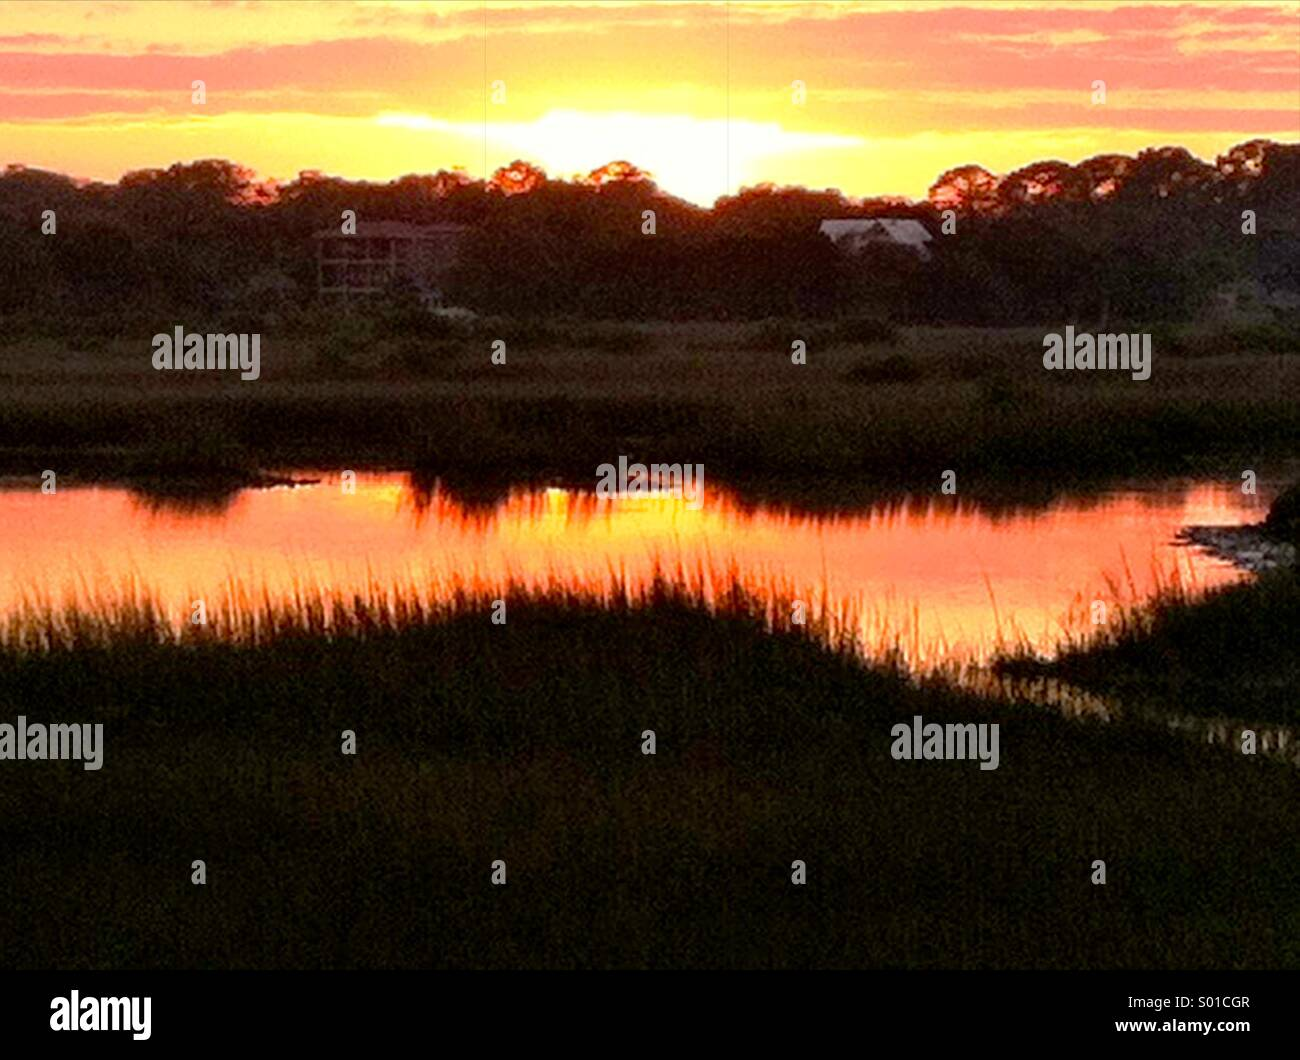 Sunset St Augustine FL - Stock Image